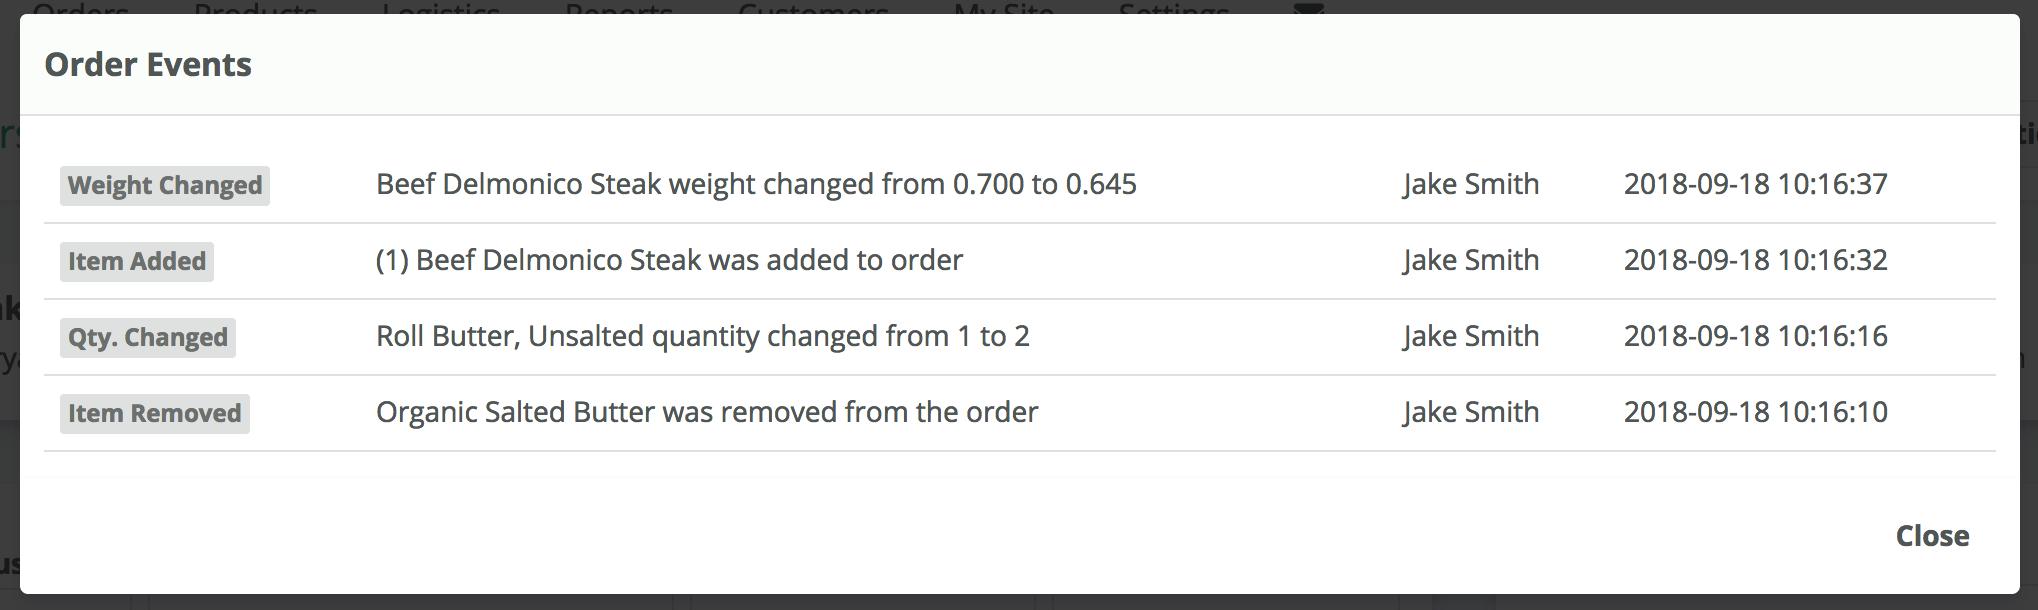 order_log.jpg